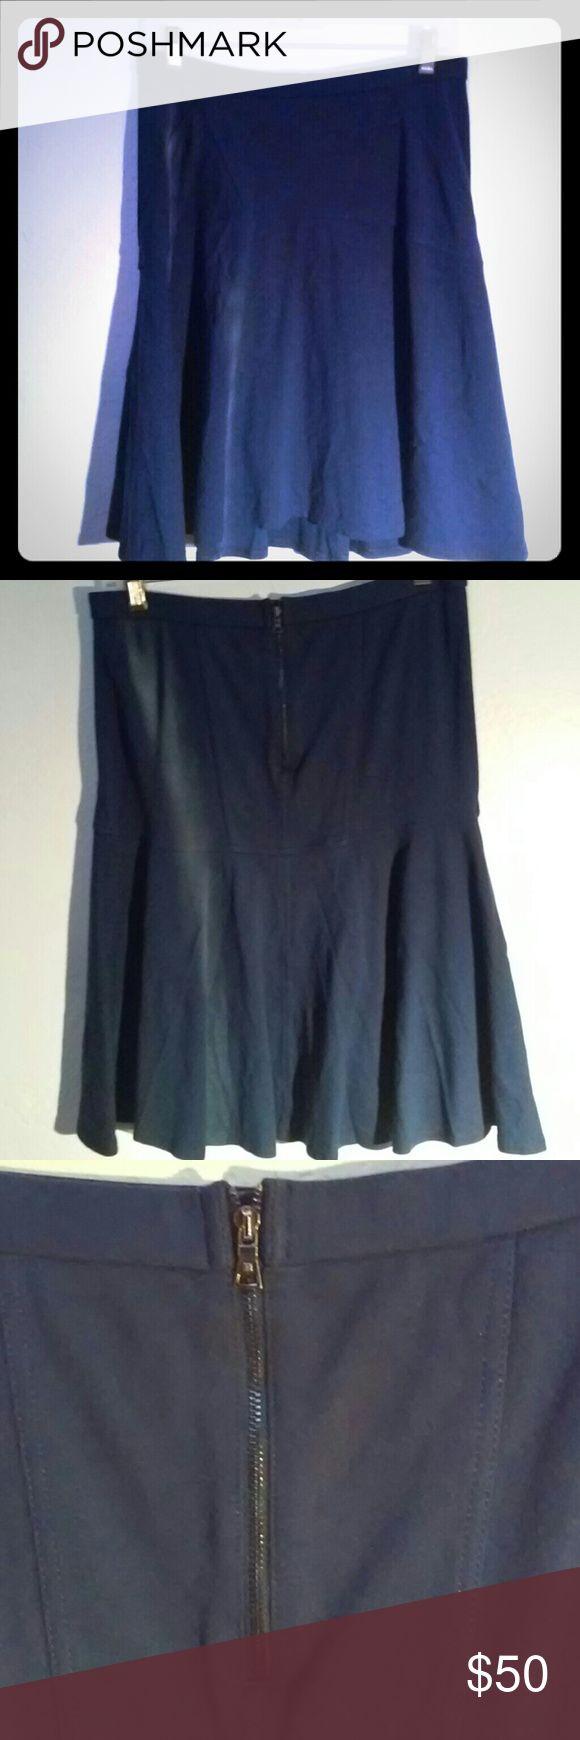 bcbg Max Azria royal blue knit mid length skirt Body hugging fit & flare styling. Like new. Smoke free home BCBGMaxAzria Skirts Midi